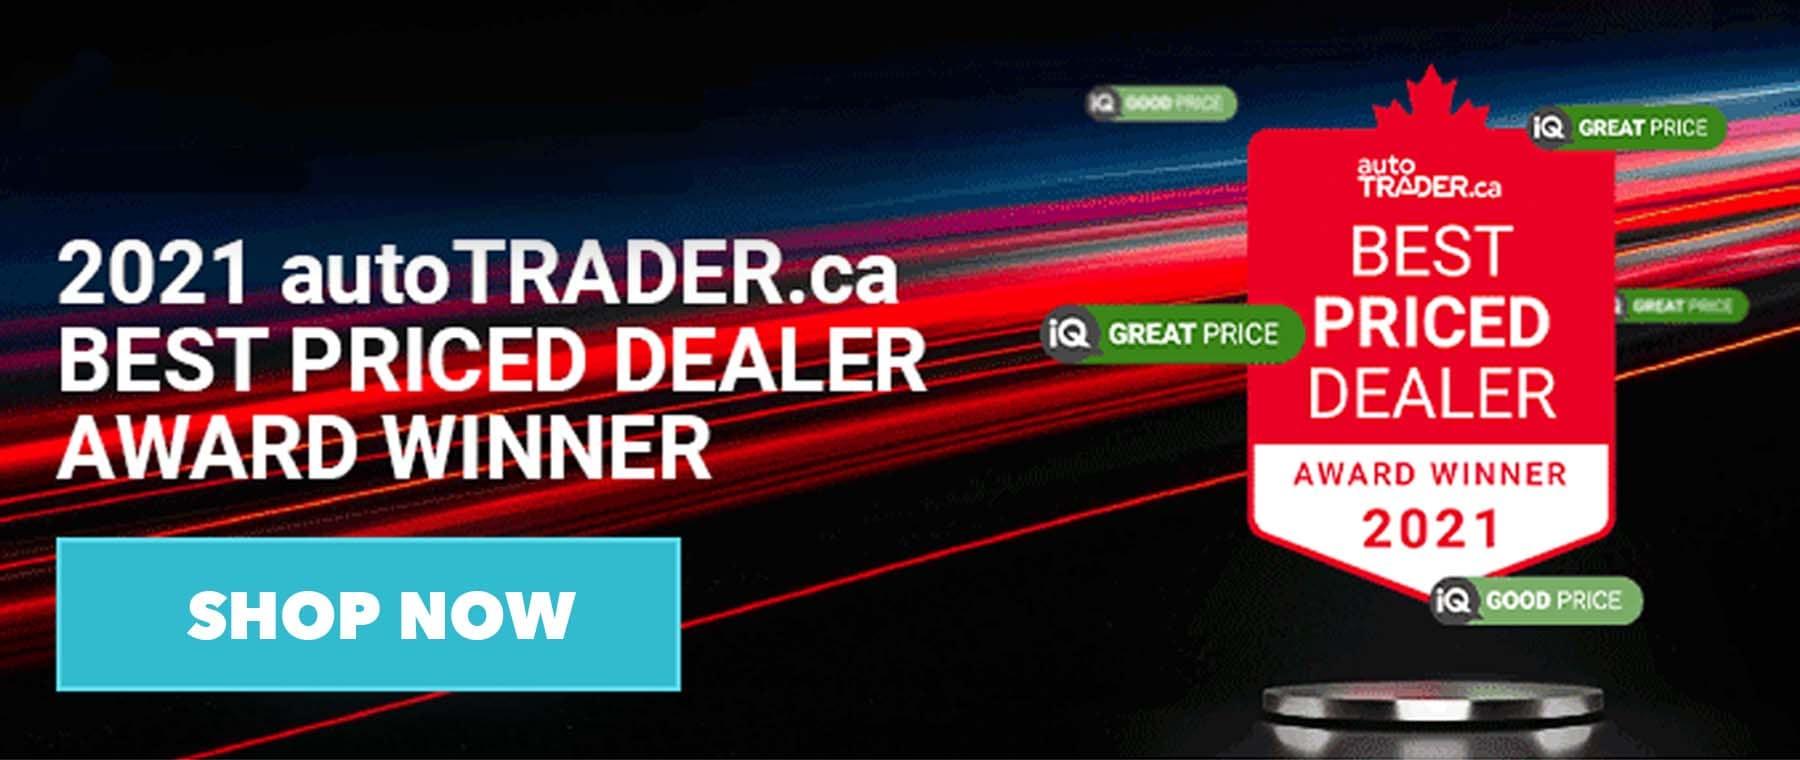 Pickering Honda in Pickering Ontario is Auto Trader's Best Priced 2021 Dealer Award